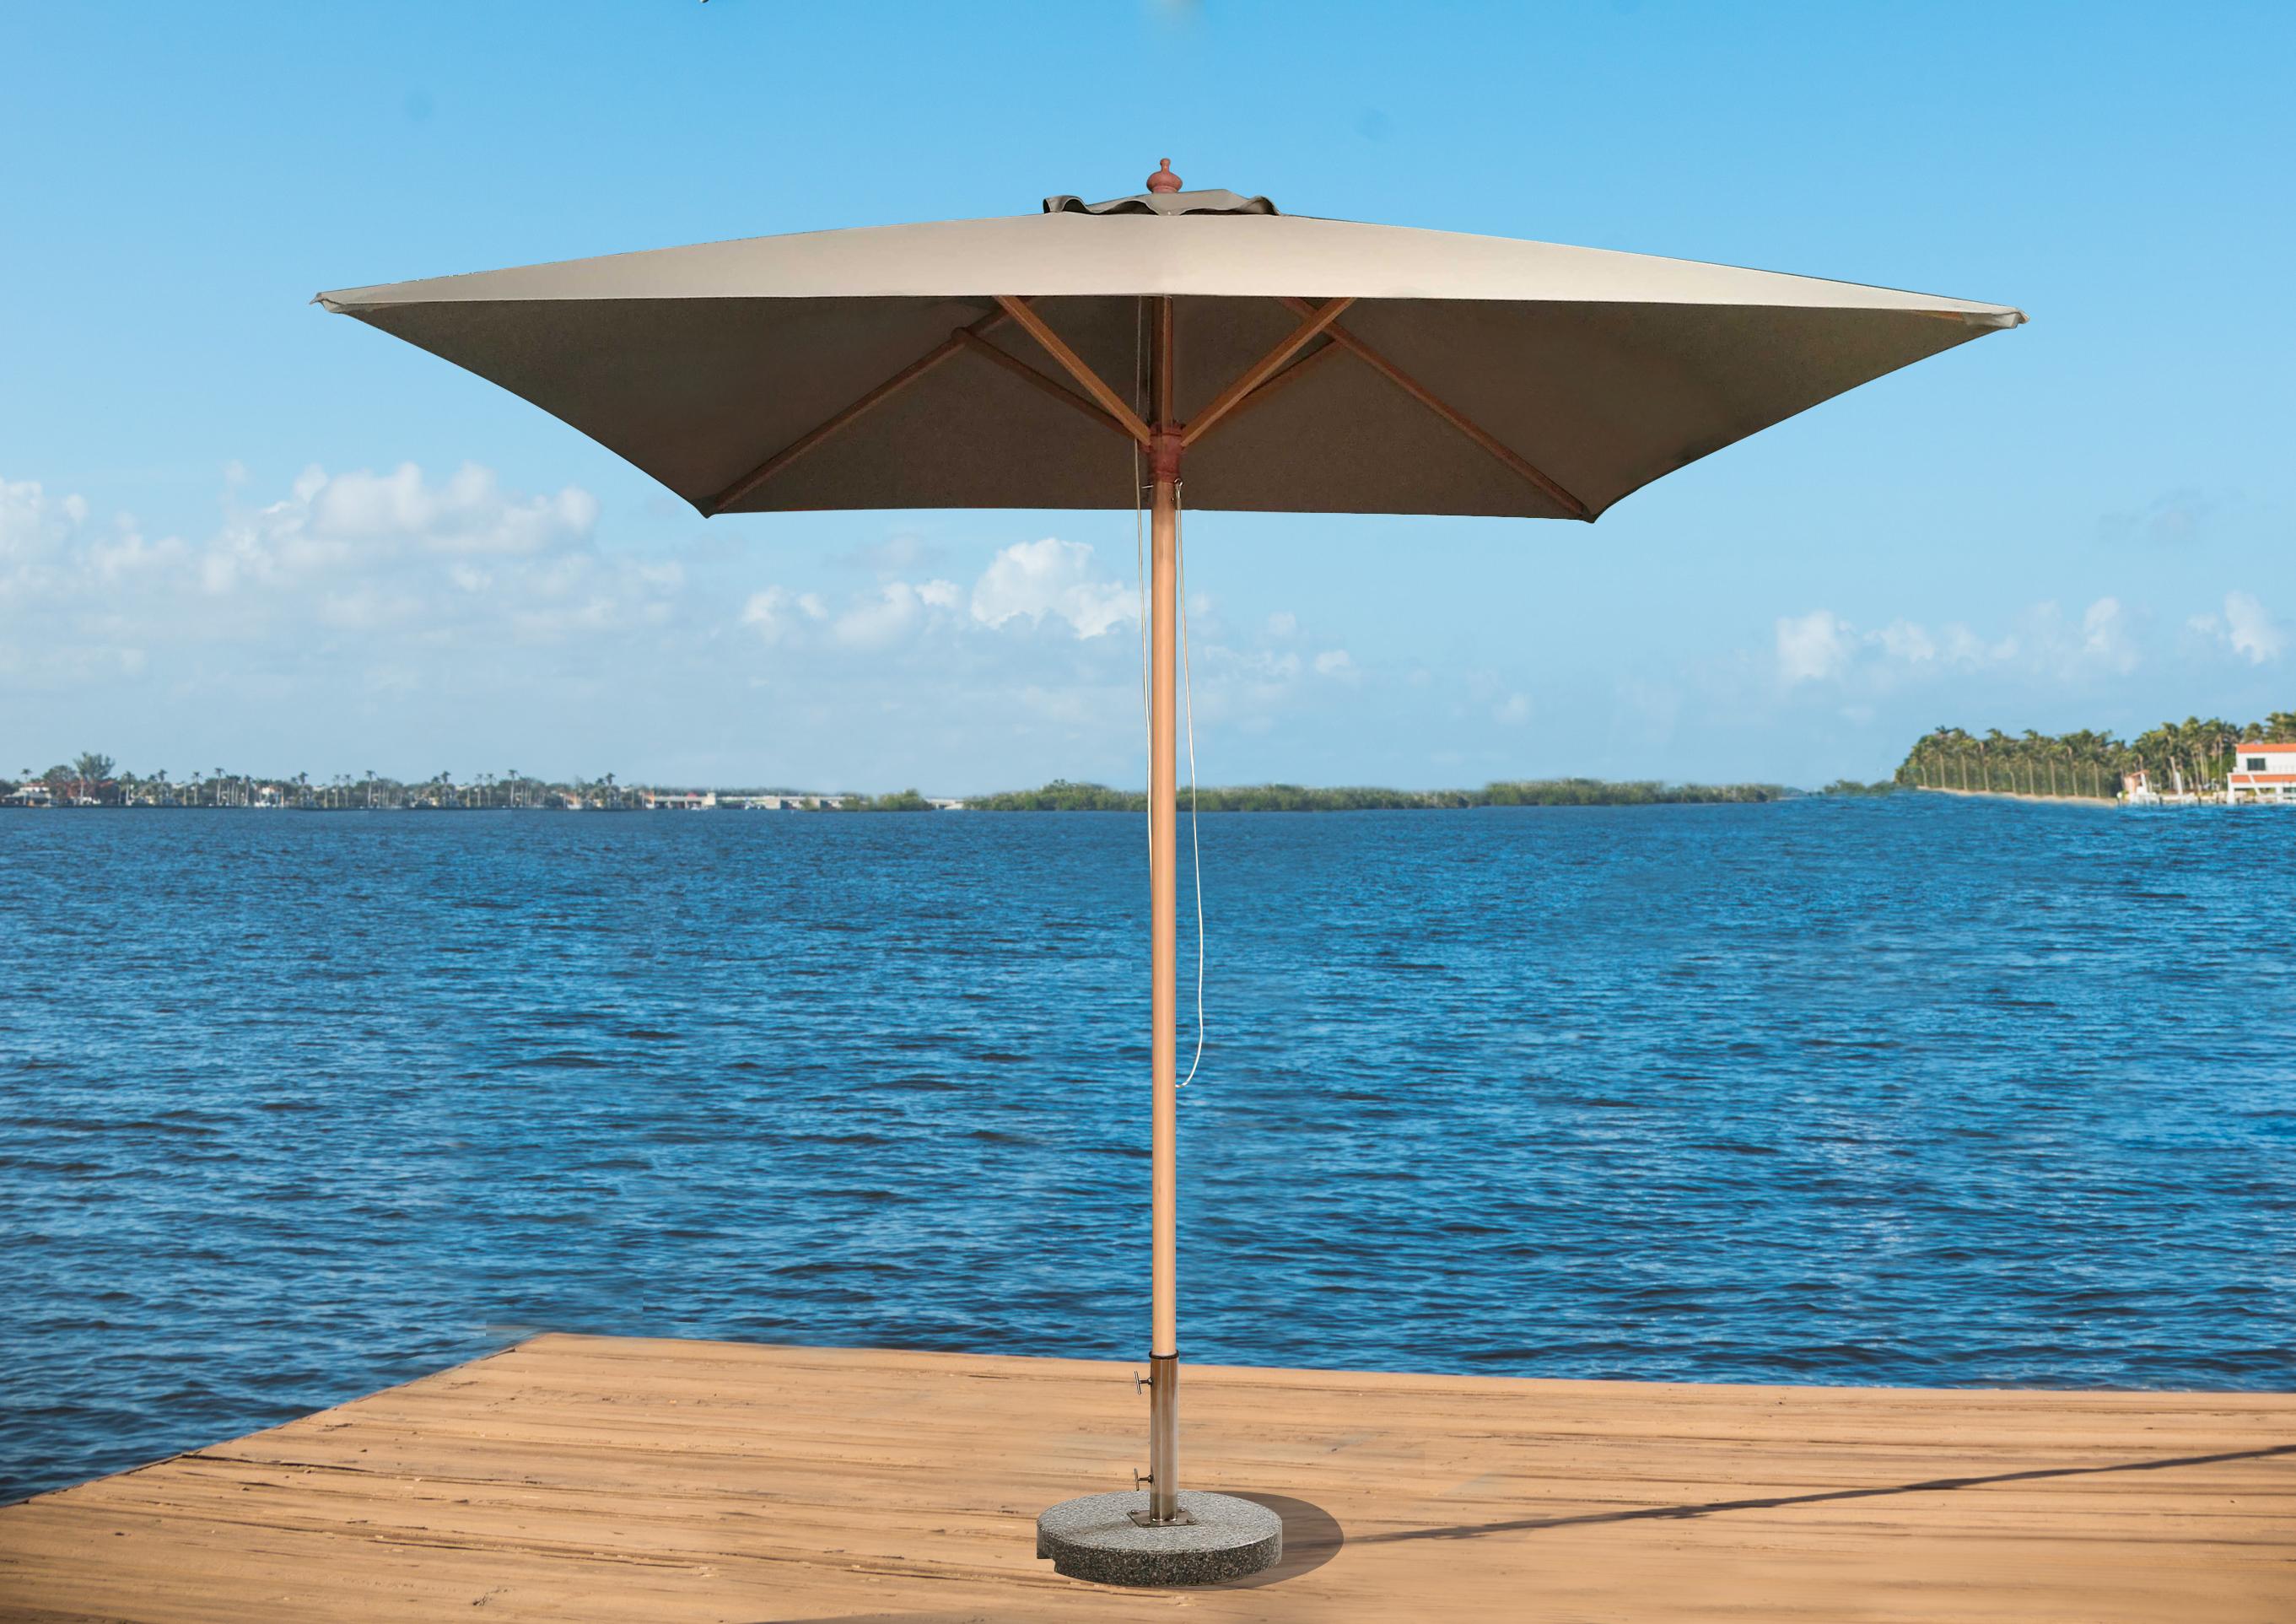 commercial beach umbrella